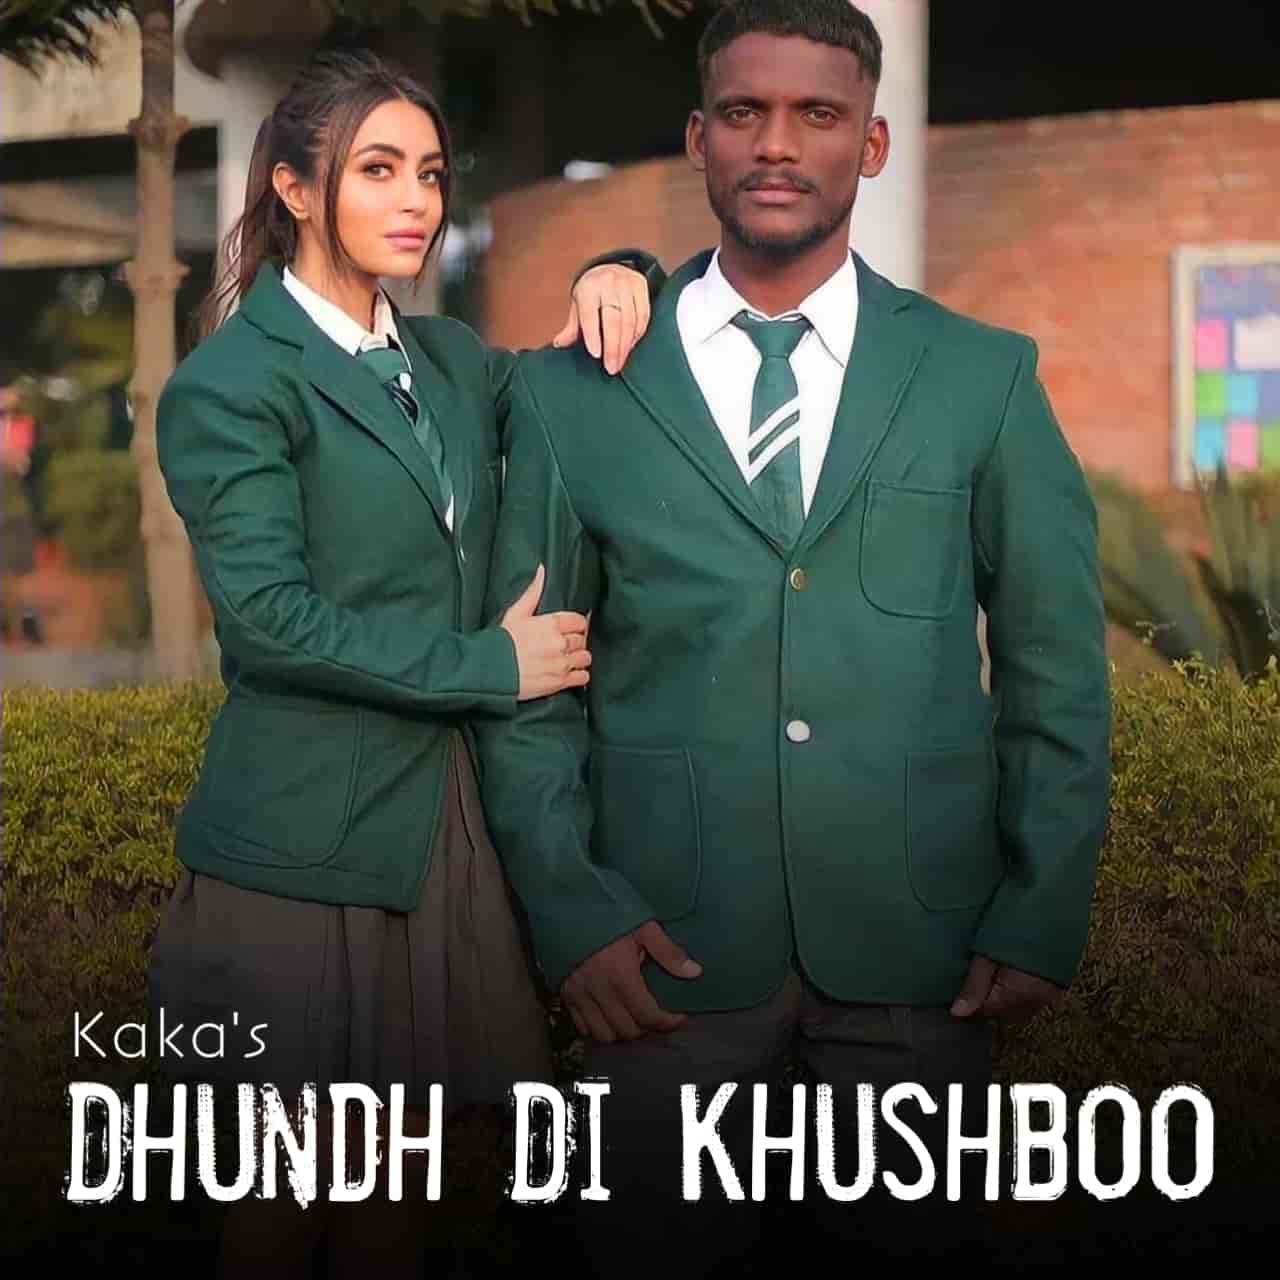 Dhundh Di Khushboo Punjabi Song Image Features Kaka